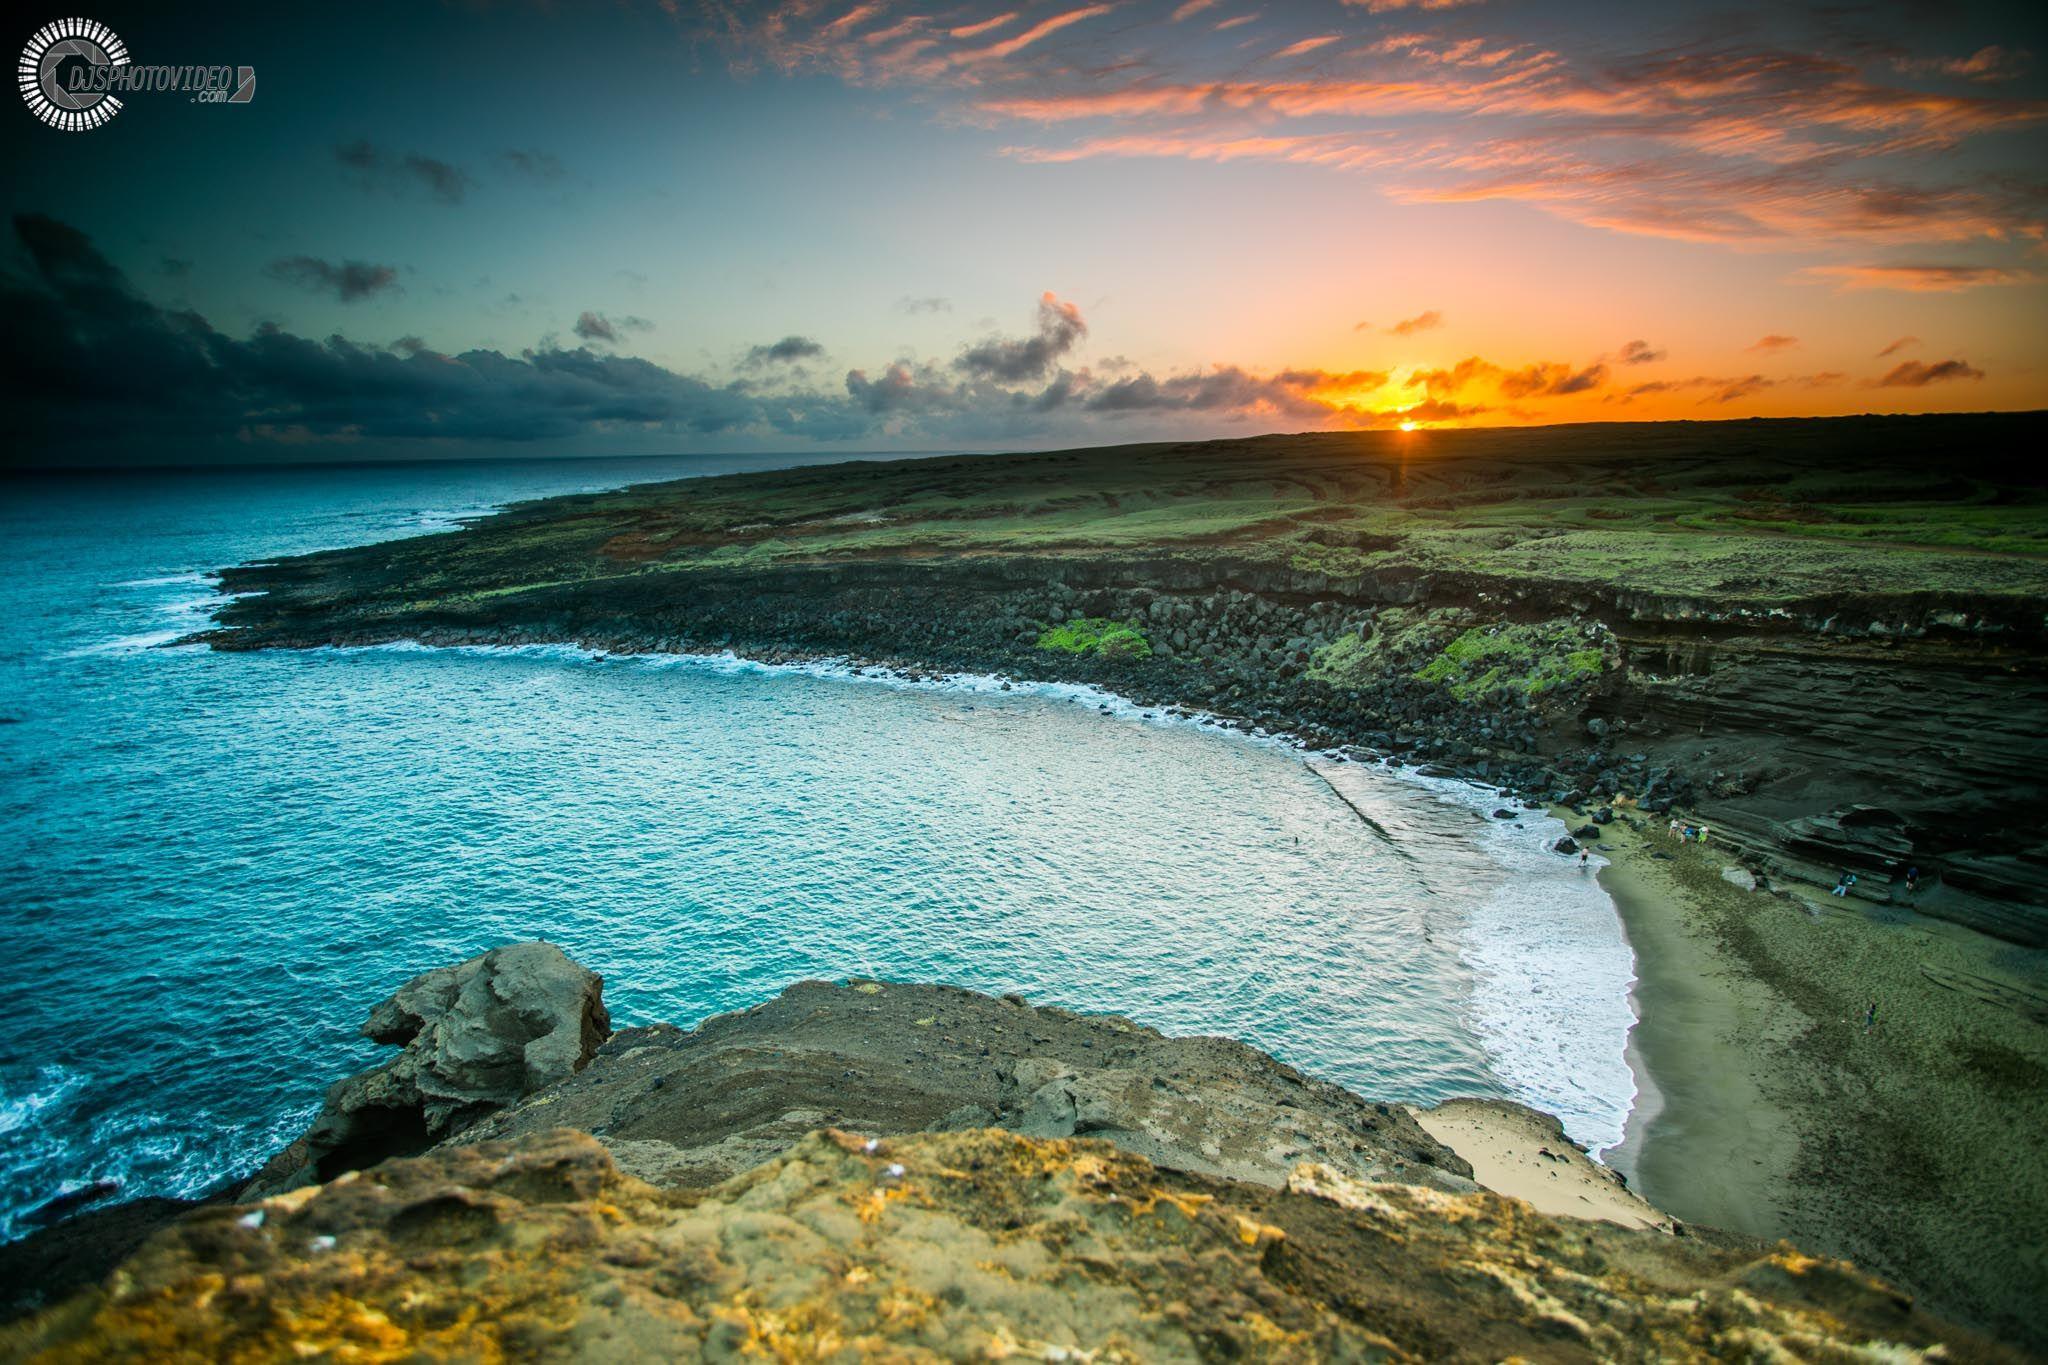 Sunset atop the rocks at Papakōlea Green Sand Beach